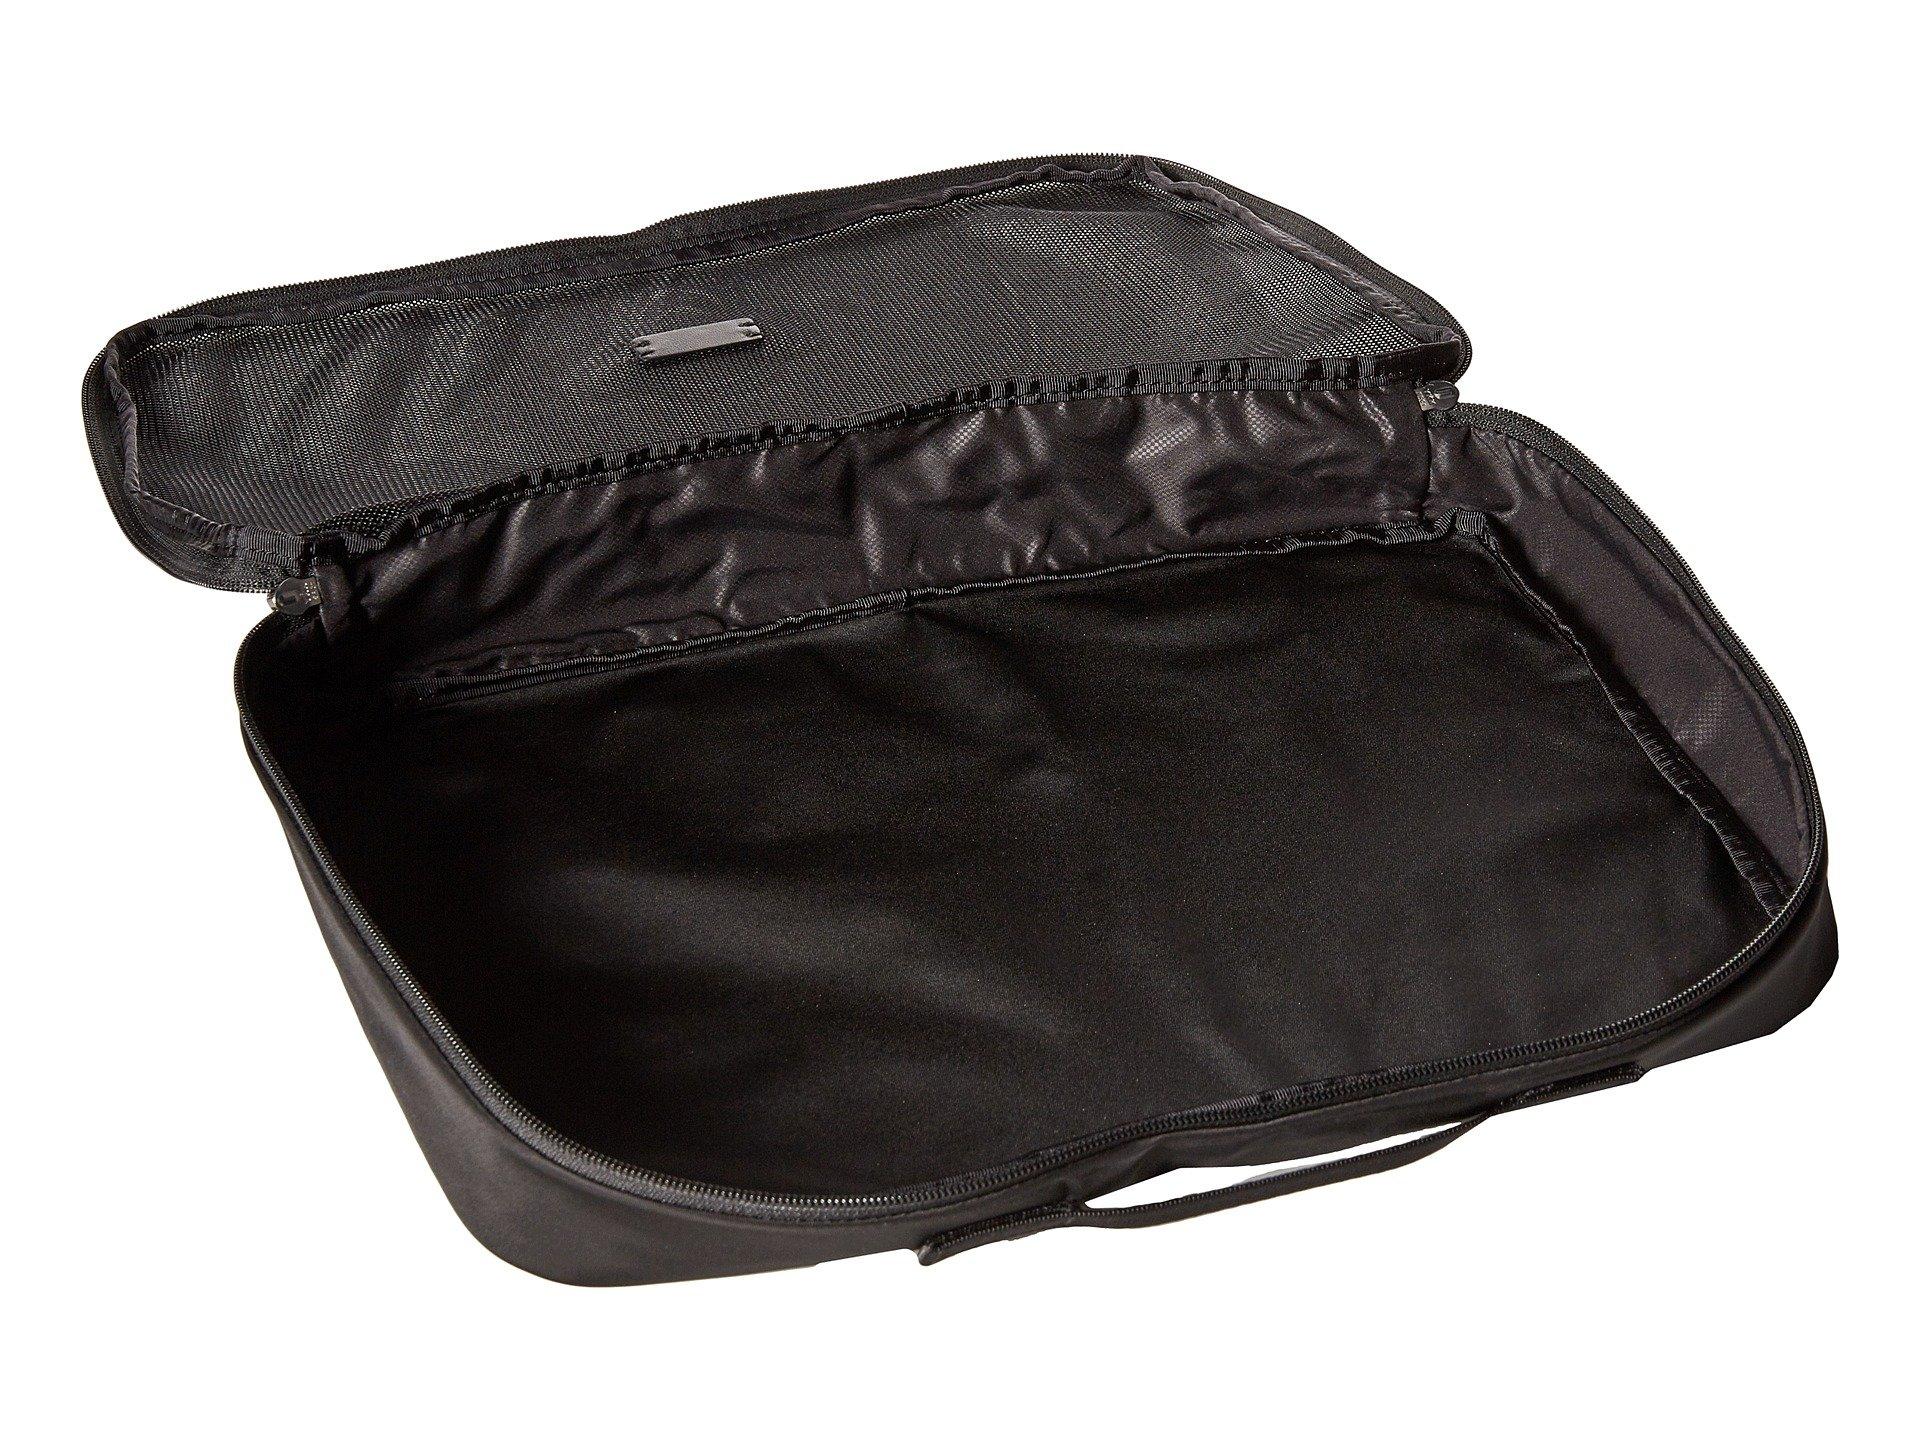 Large Packing Packing Tumi Packing Large Tumi Cube Black Black Tumi Large Cube 5Uwyq6z